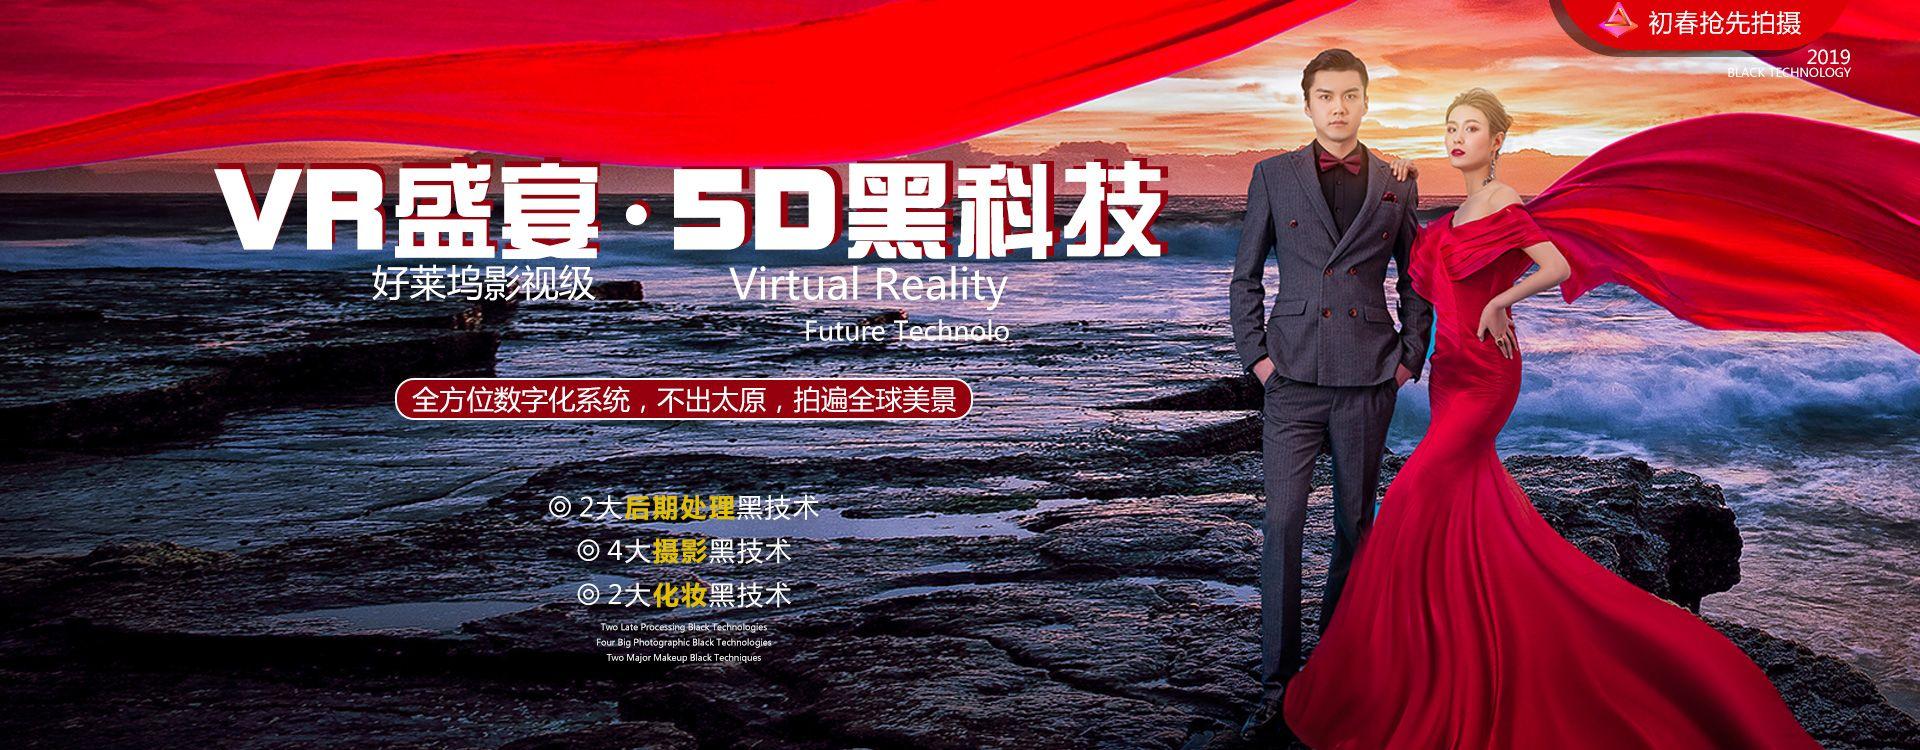 《VR盛宴·5D黑科技》